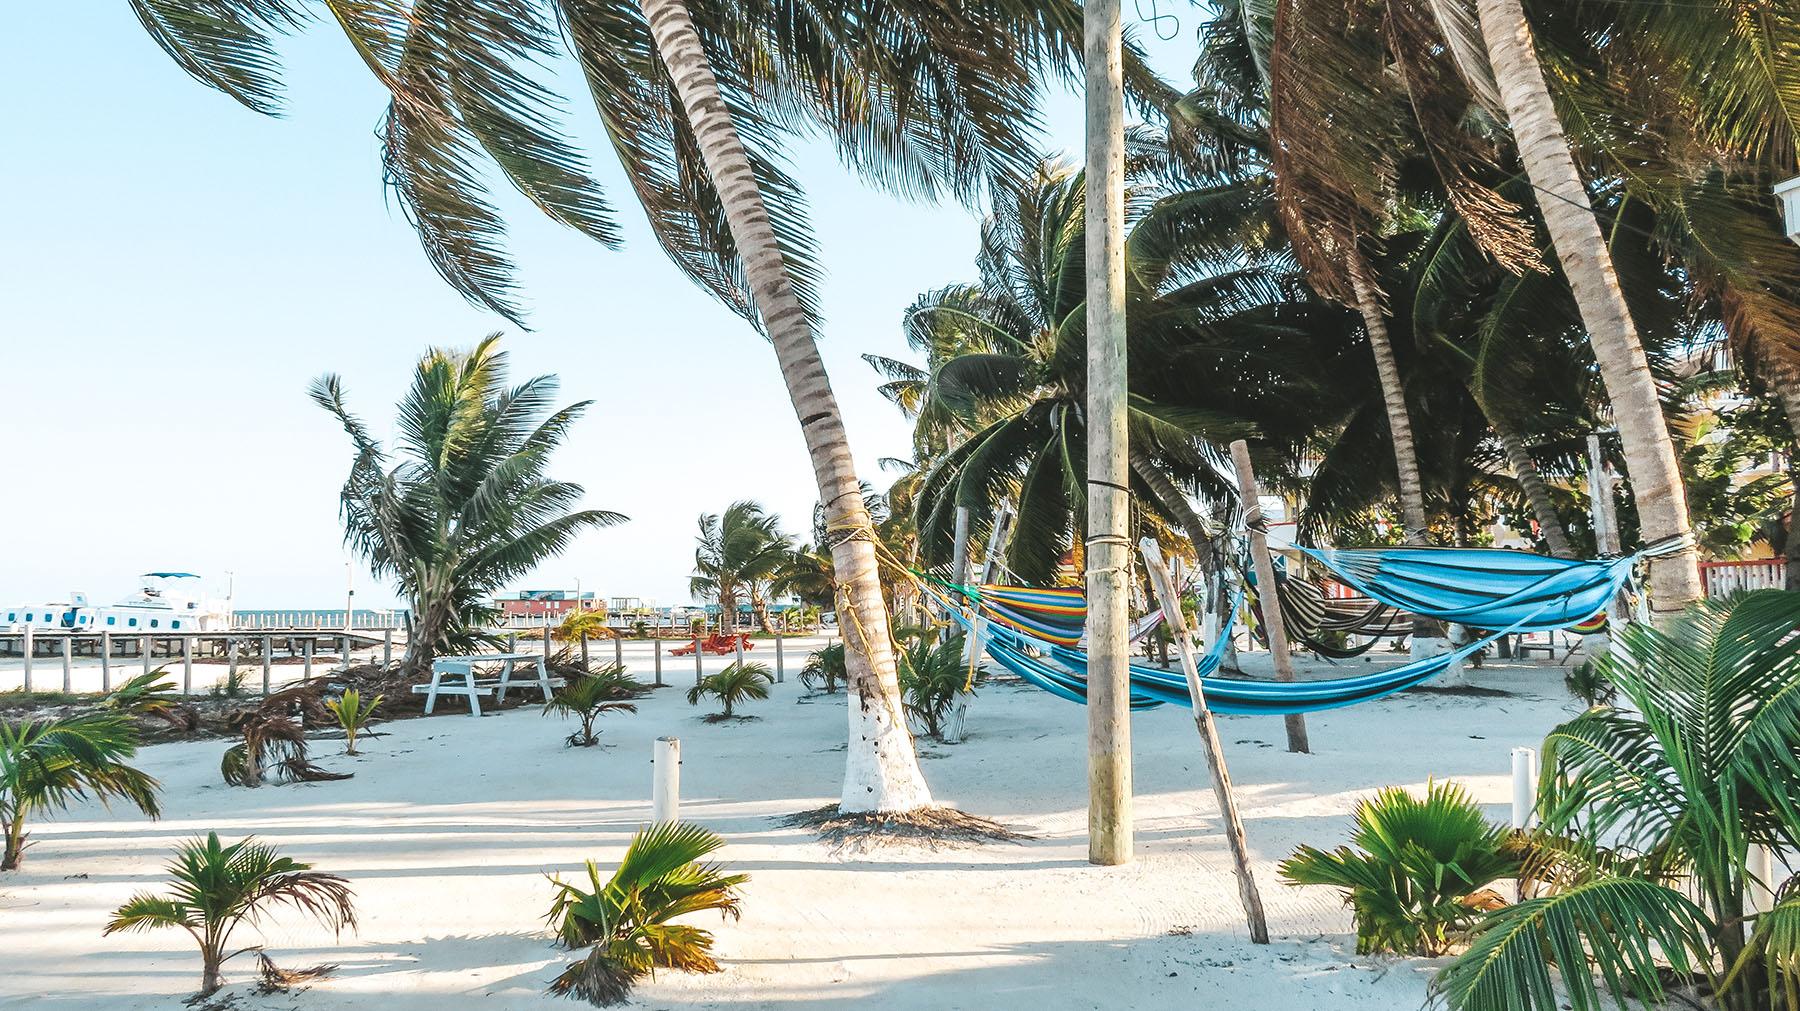 Belize Caye Caulker Strand Hängematten